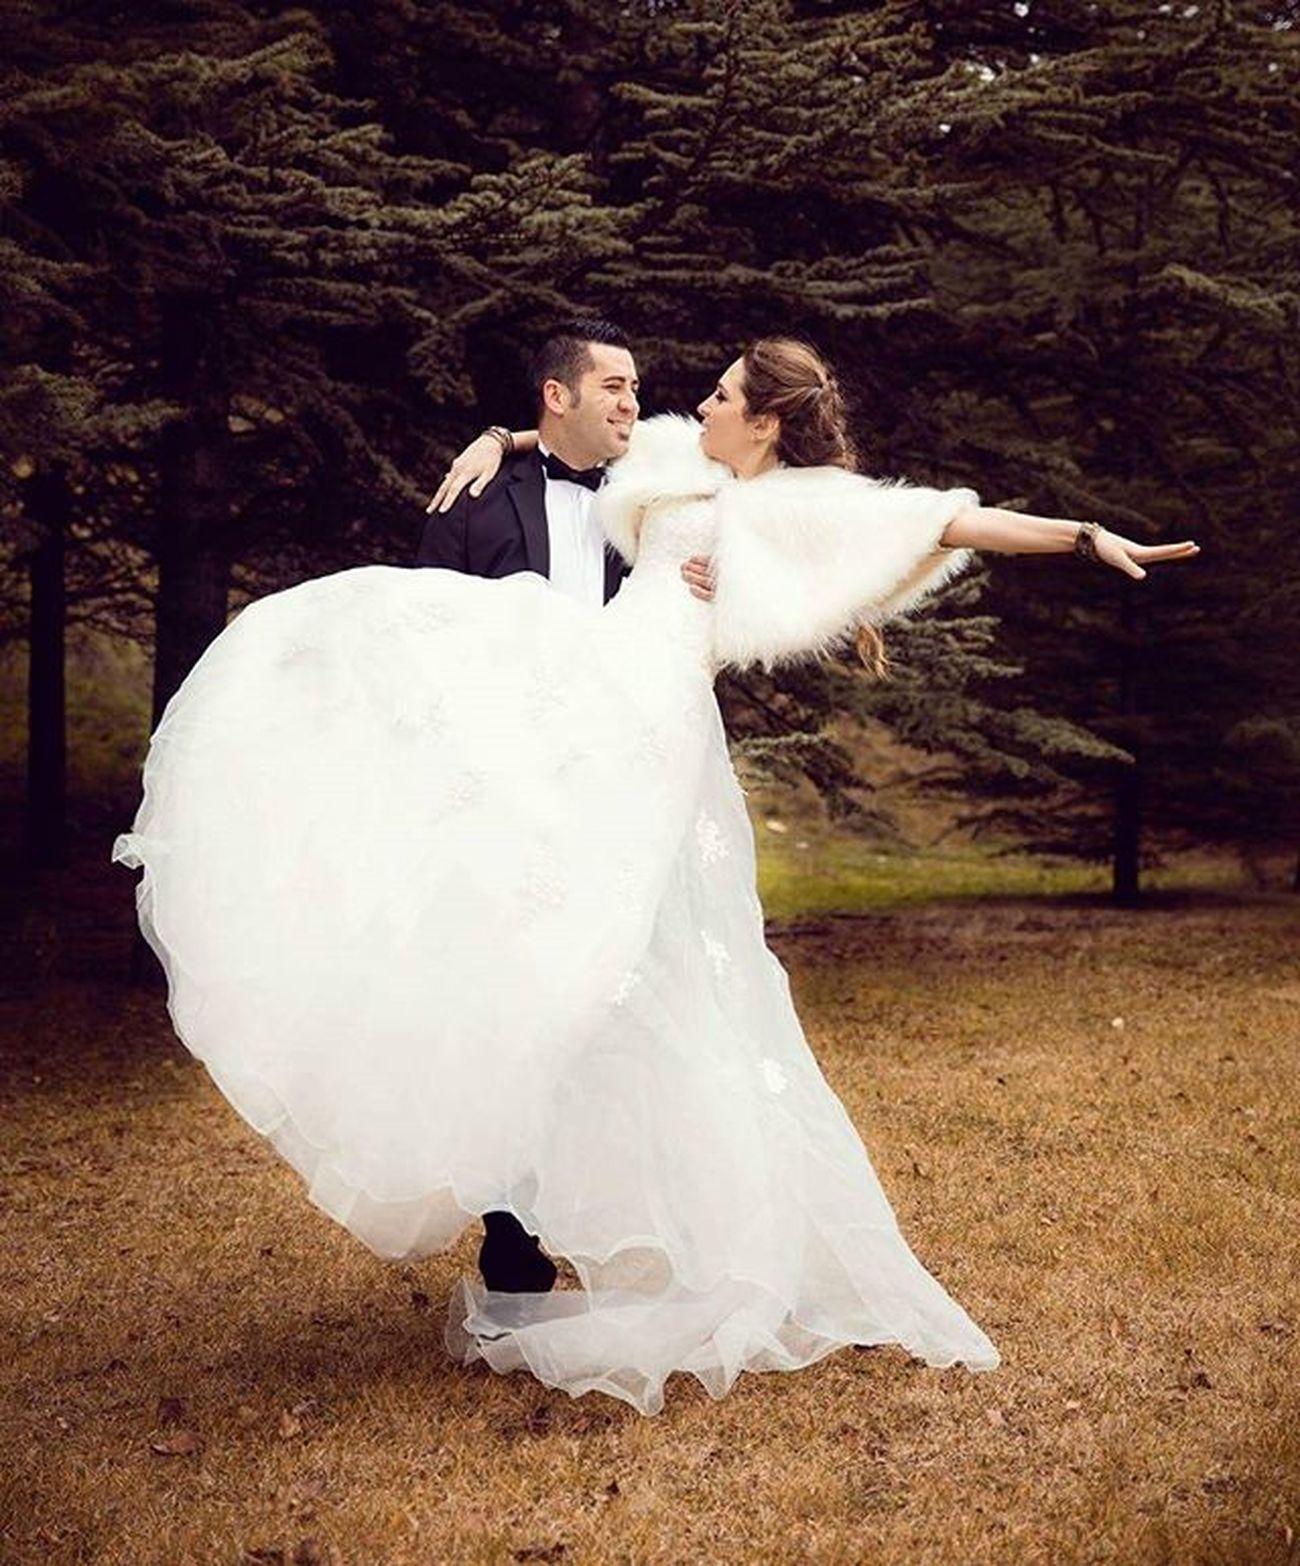 Some fun... photo:@mrrywedding makeup&hair:@evrimmemili accessorise:@be.boutique Wedding Bride Happy Fun Weddingphotography Groom Dugun Dugunfotografcisi Ankara Gelin Gelinmakyajı Photoshoot Fotoğrafçekimi Profesyonelfotograf